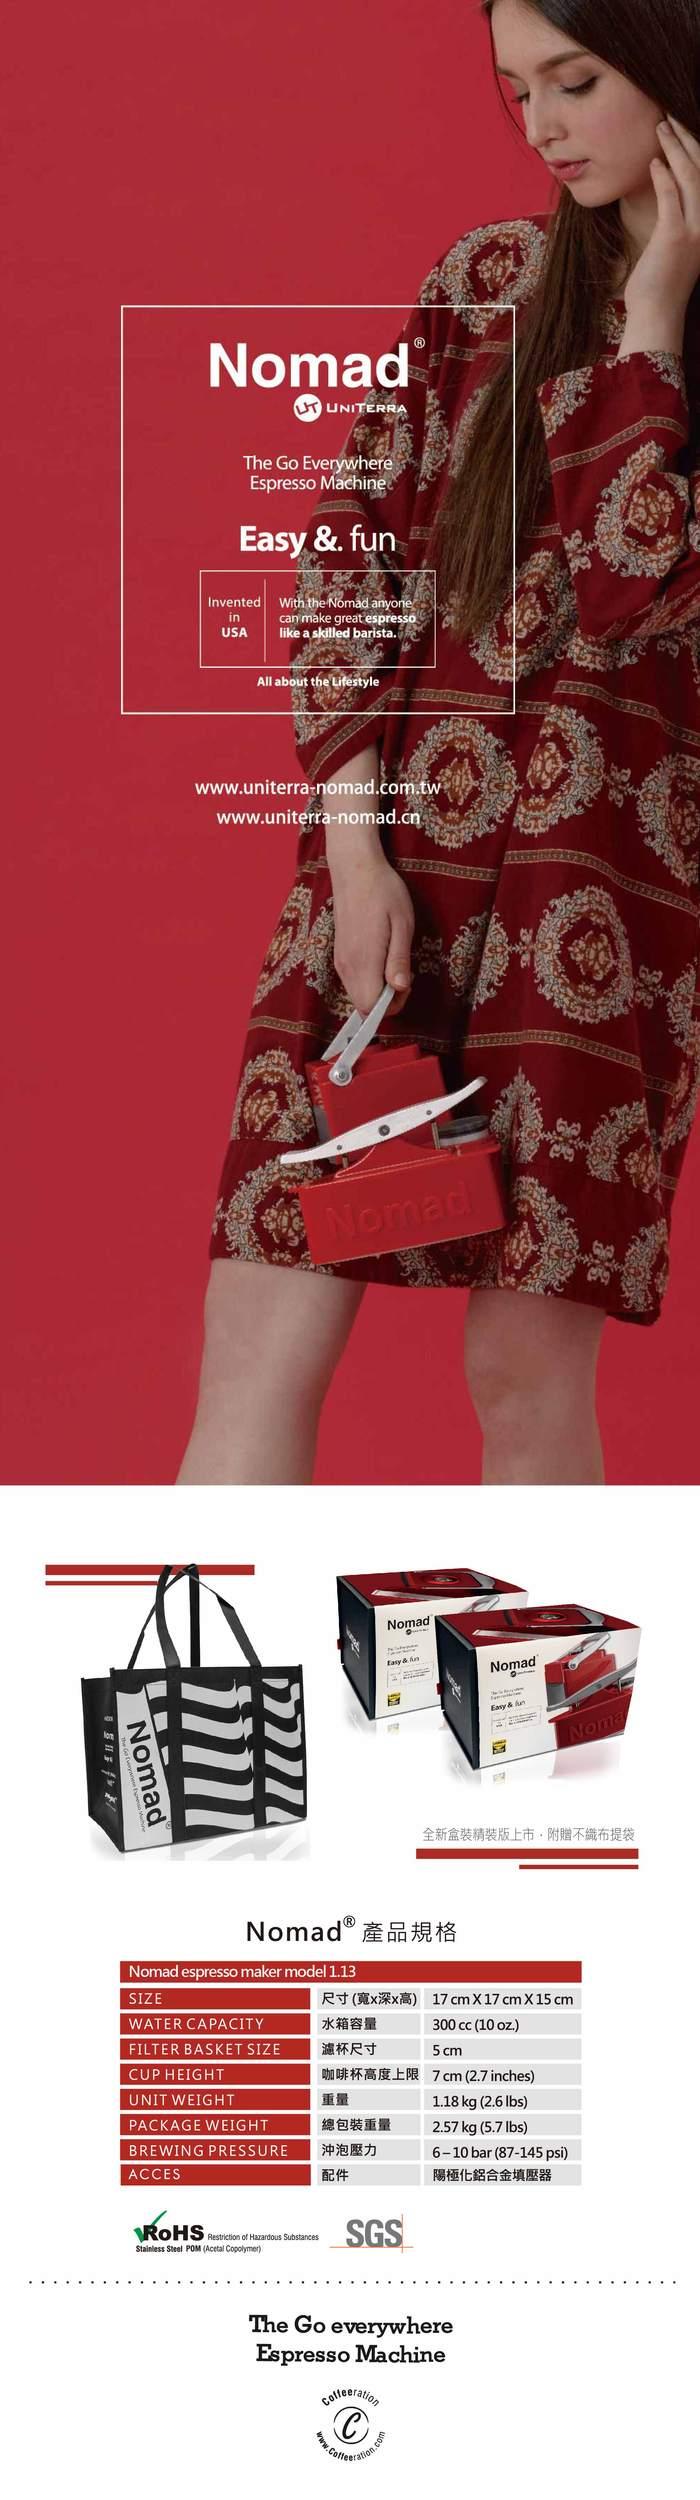 NOMAD|ESPRESSO MACHINE 精裝盒(紅) ★限量組合★